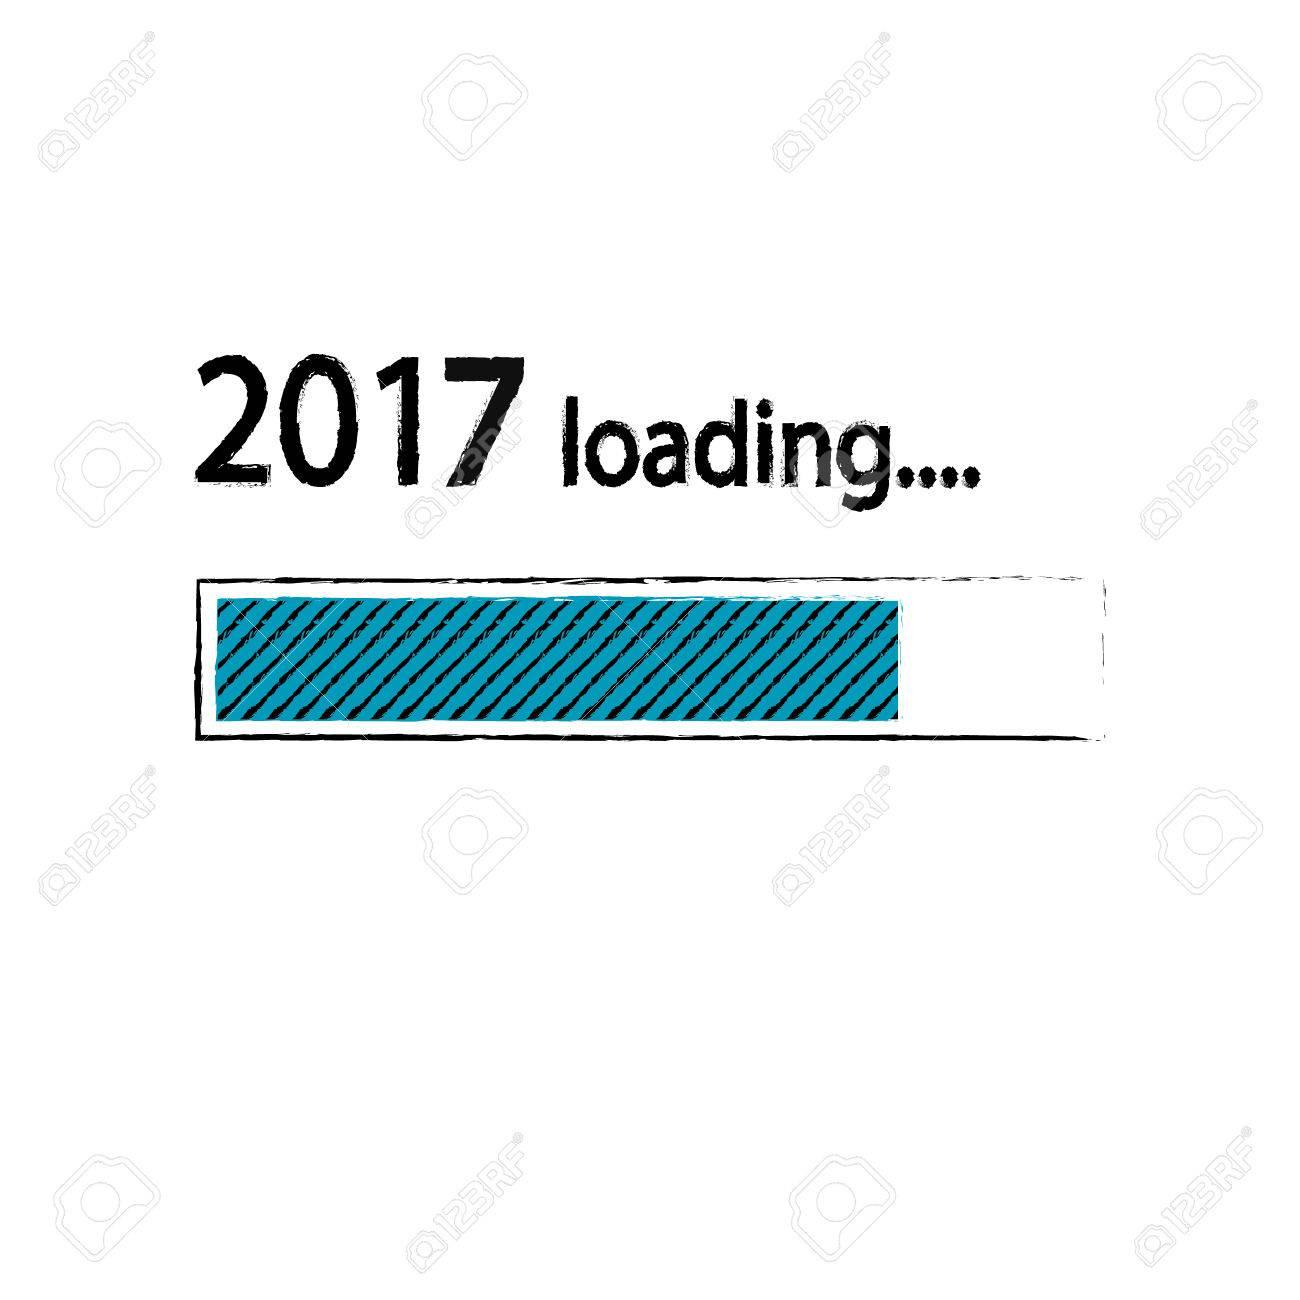 New year 2017 loading background happy new year funny business new year 2017 loading background happy new year funny business concept mail load voltagebd Choice Image